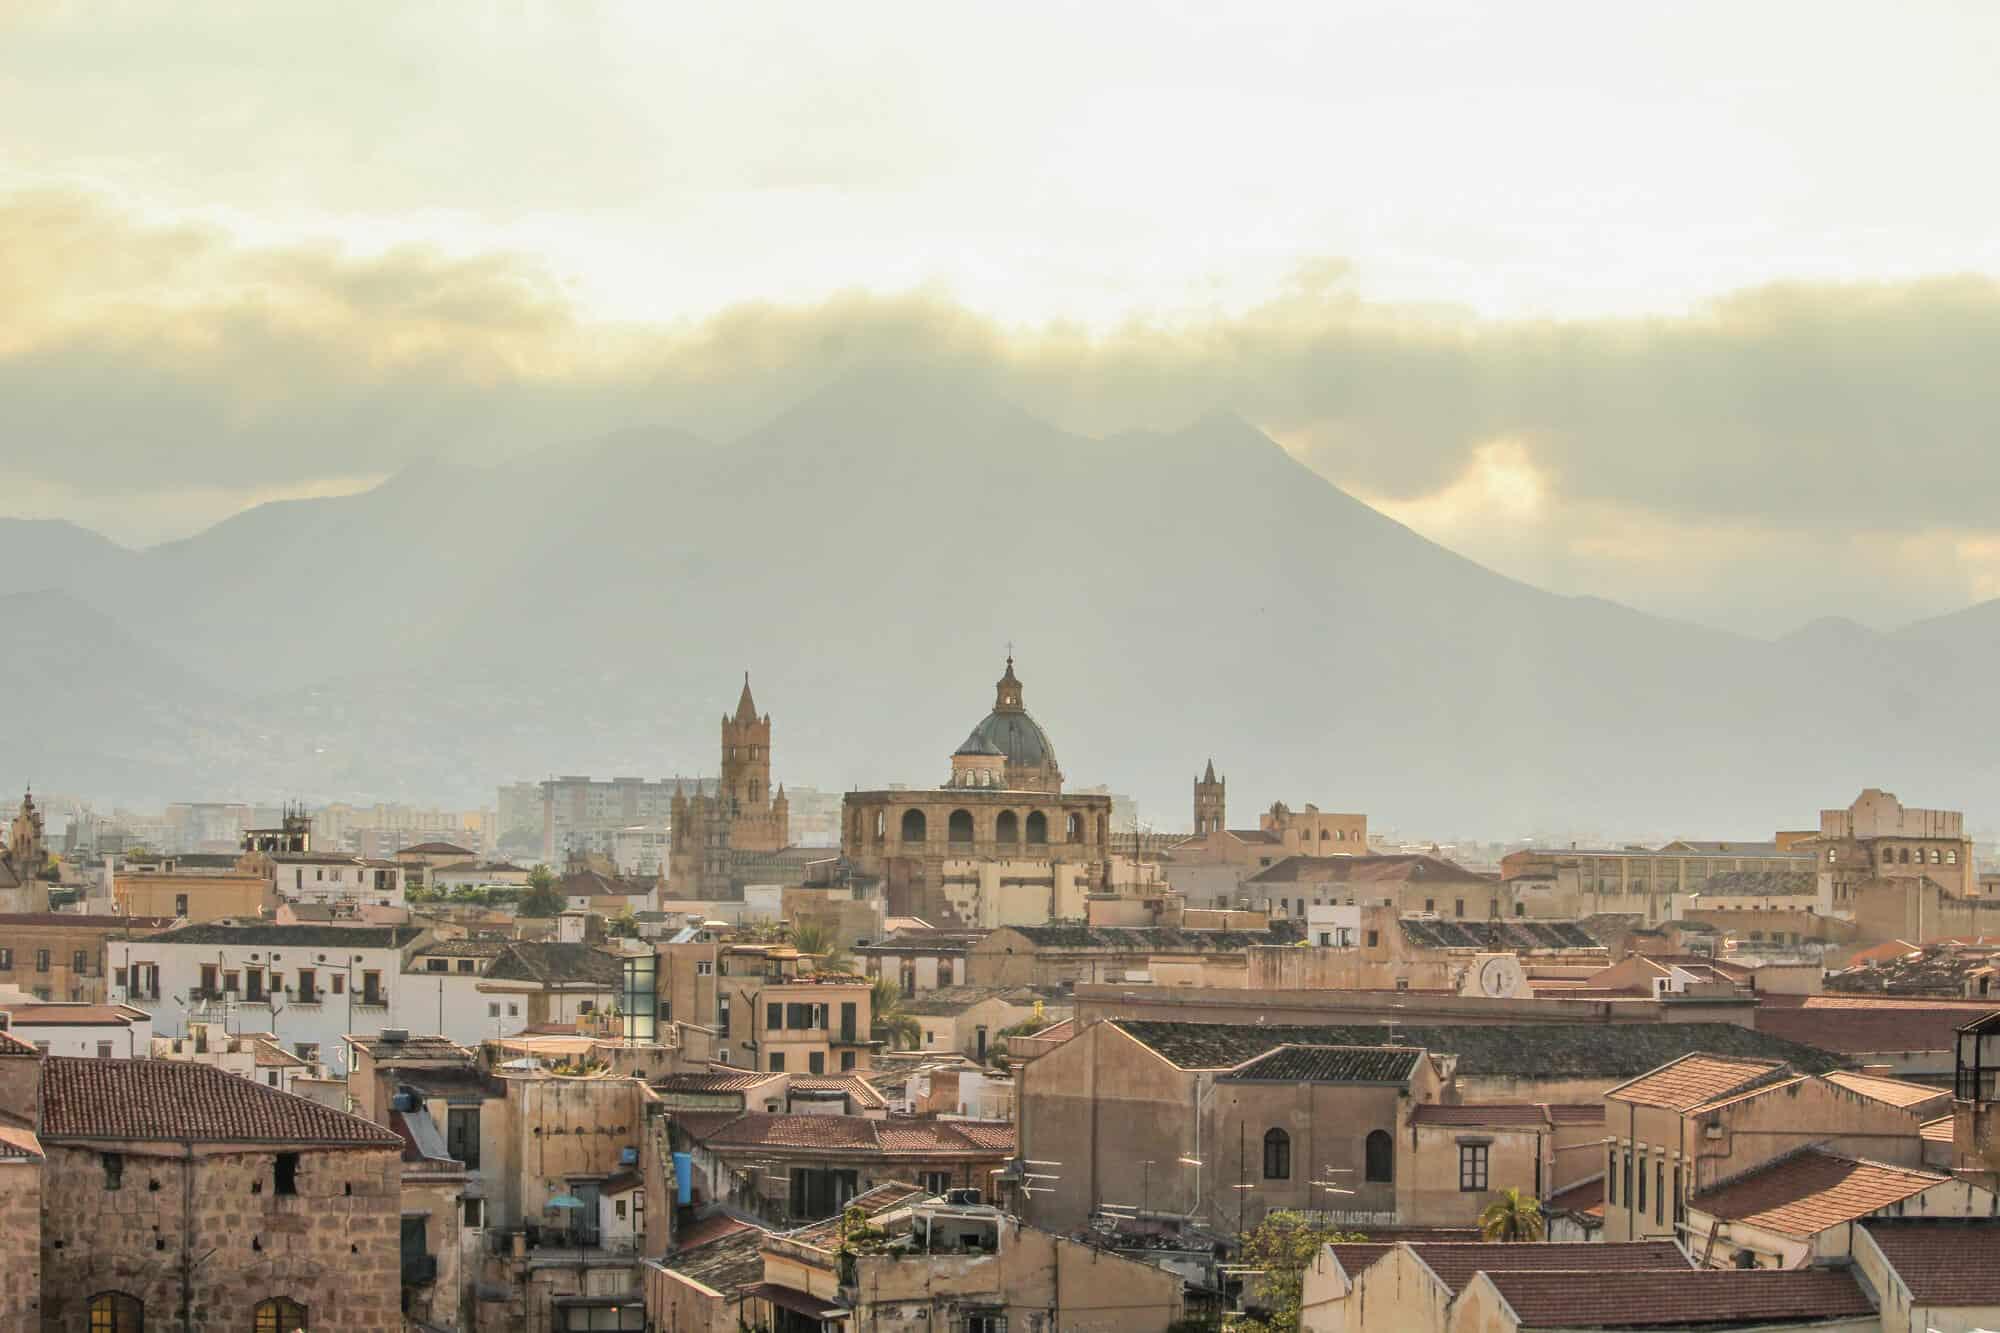 Palermo vom Ambasciatori